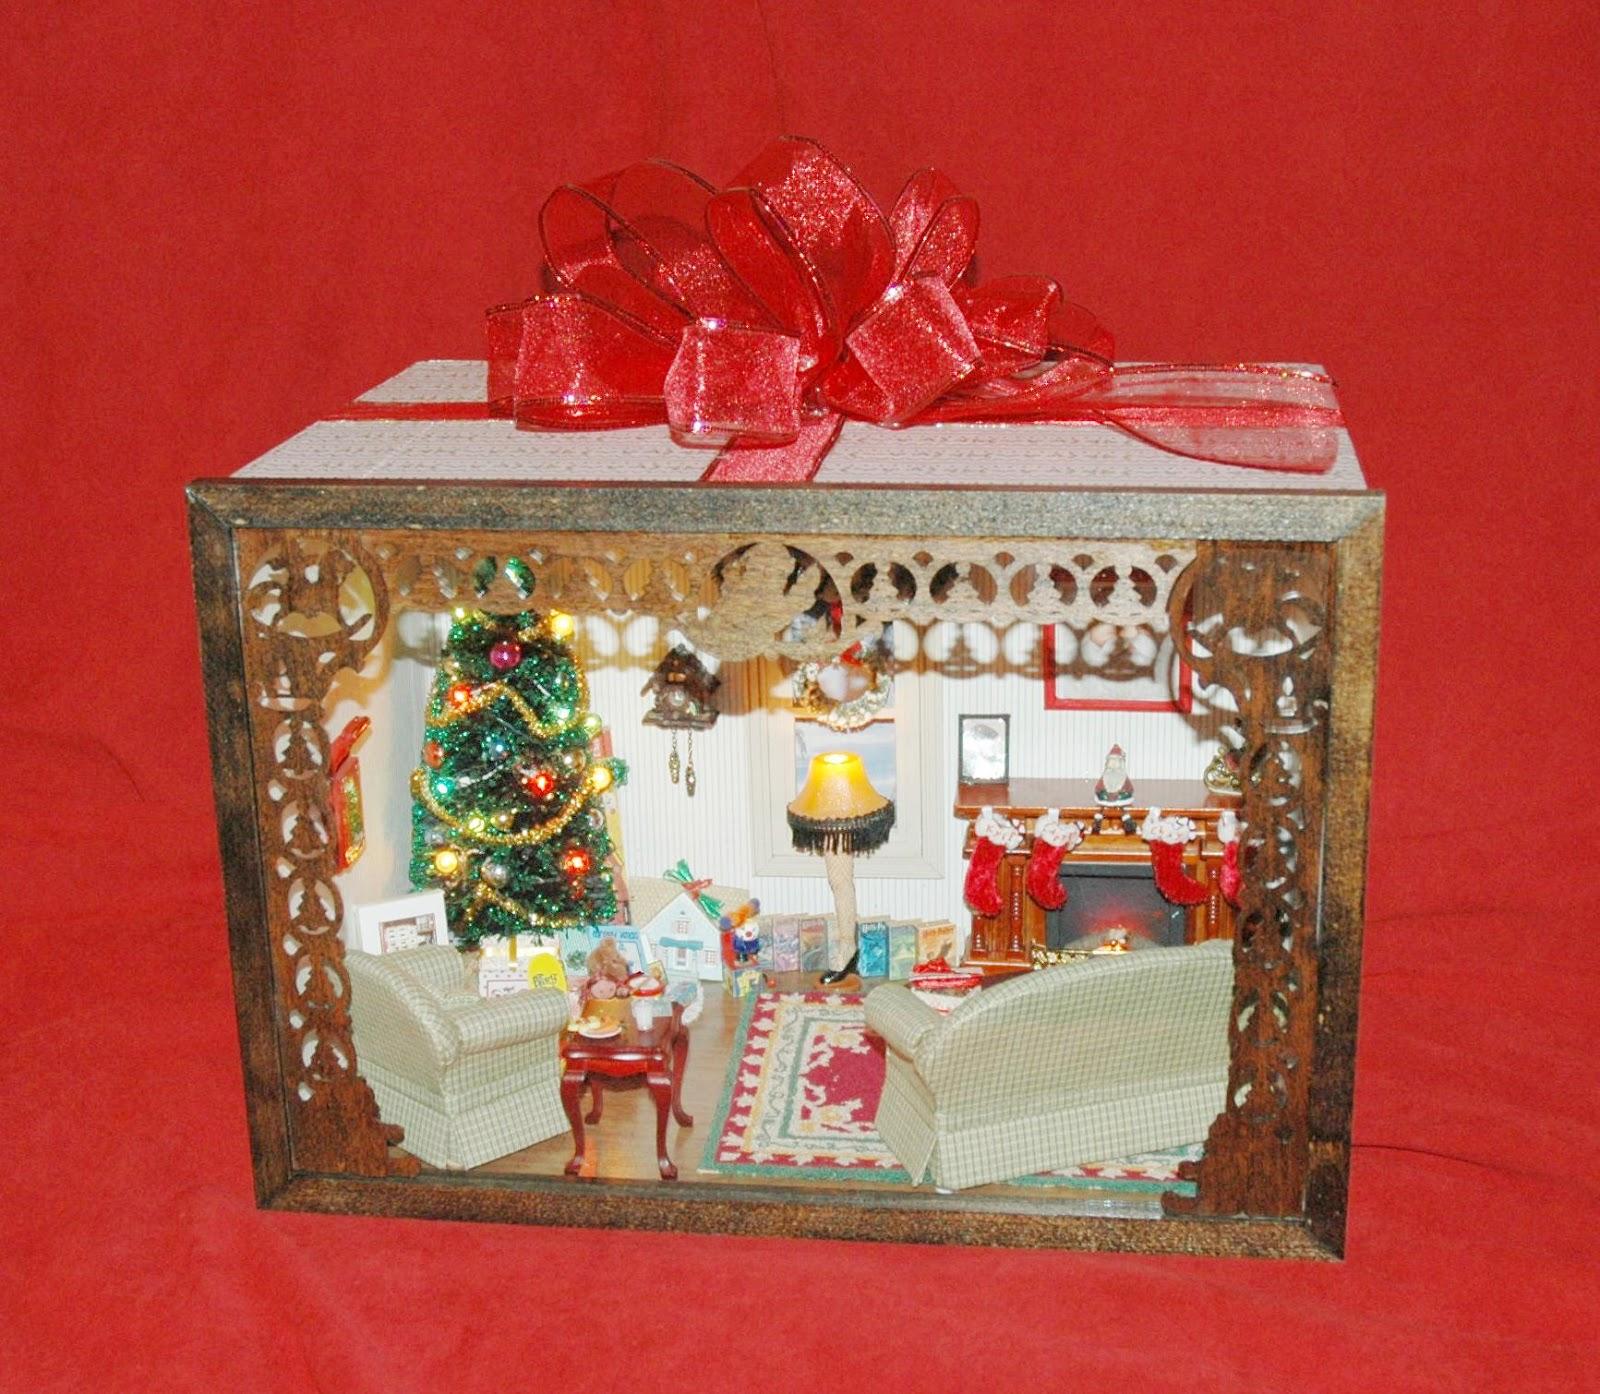 Honey, I Shrunk The House!: Christmas Room Box